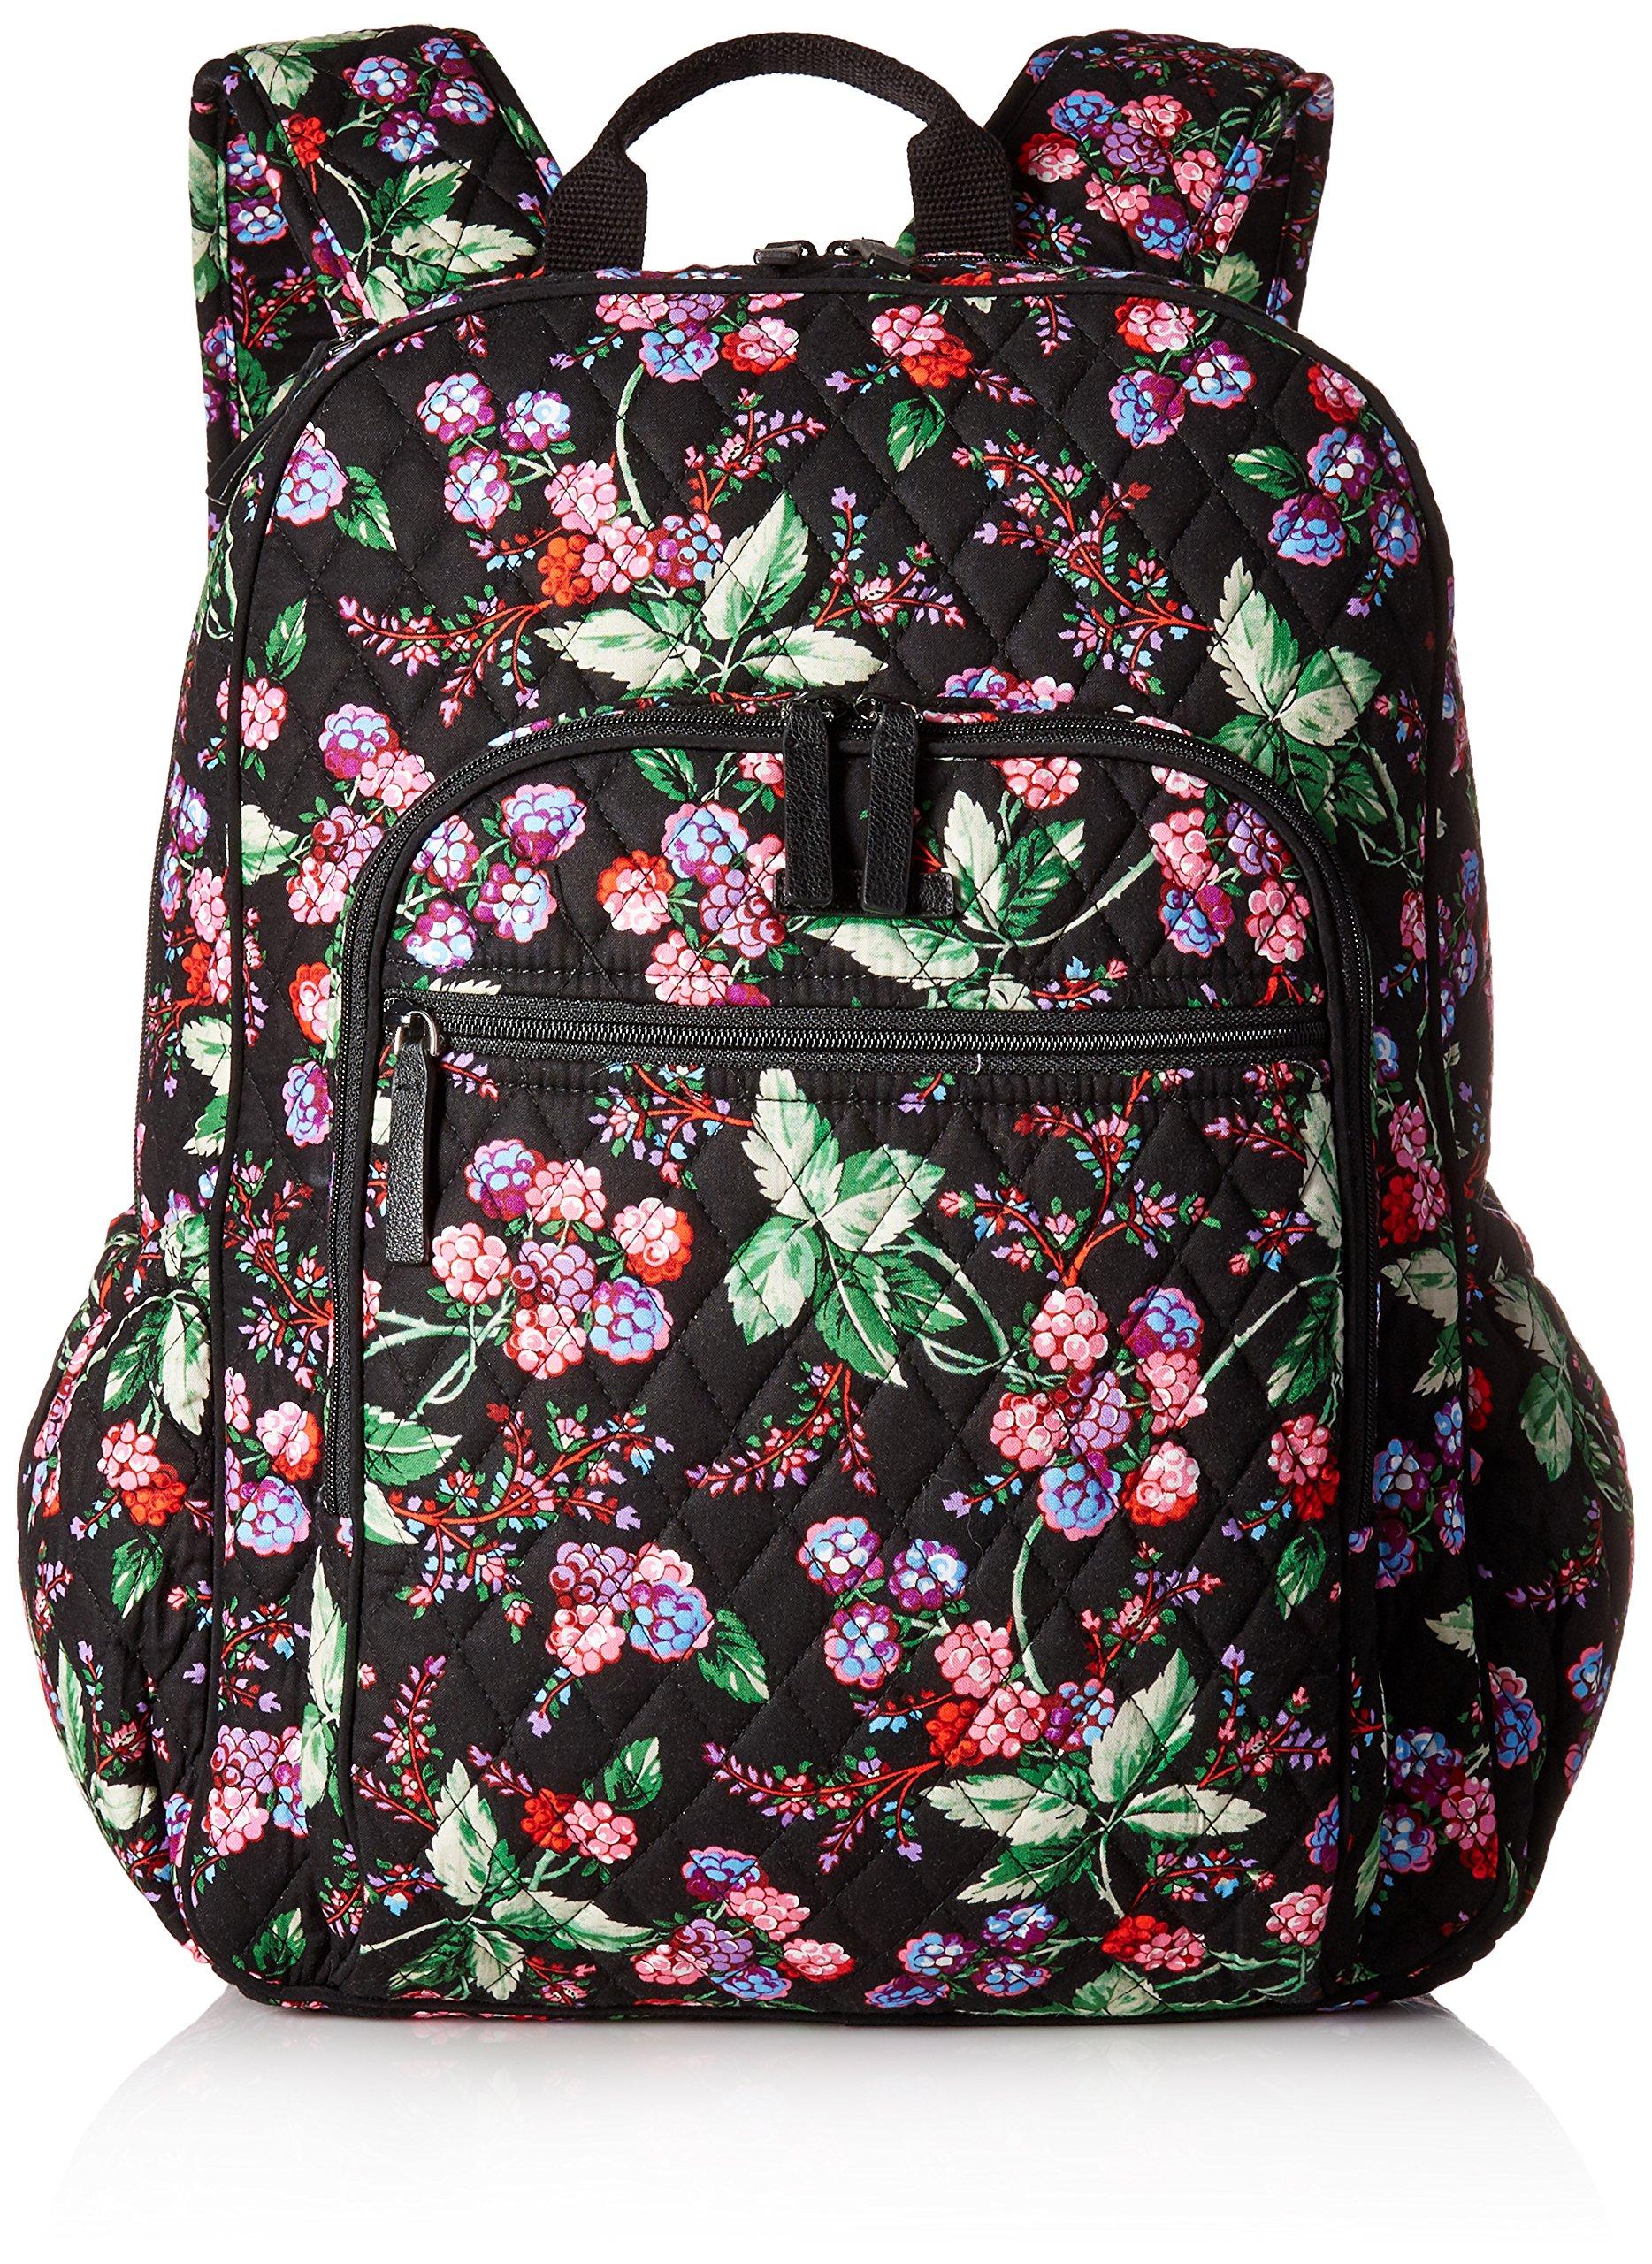 Vera Bradley Women's Campus Tech Backpack, Winter Berry by Vera Bradley